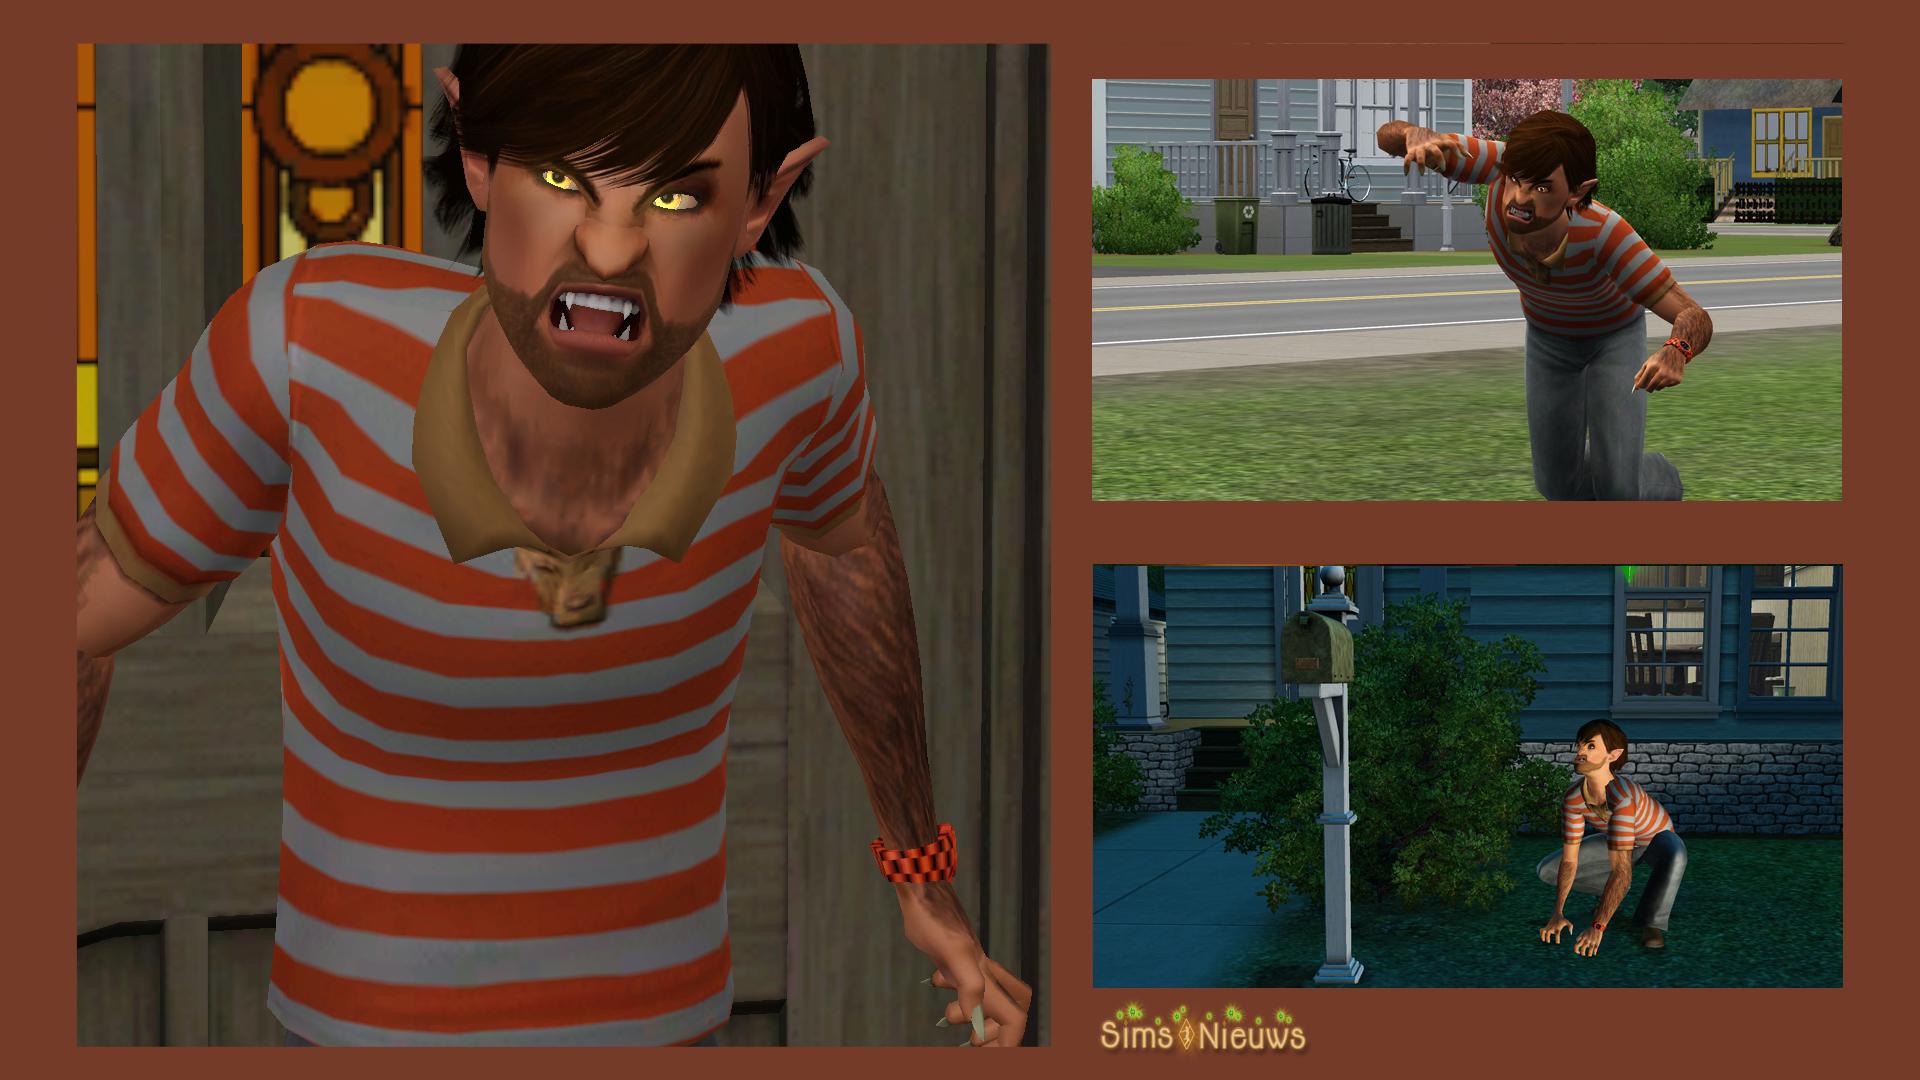 F.A.Q. по проблемам с графикой The Sims Club in